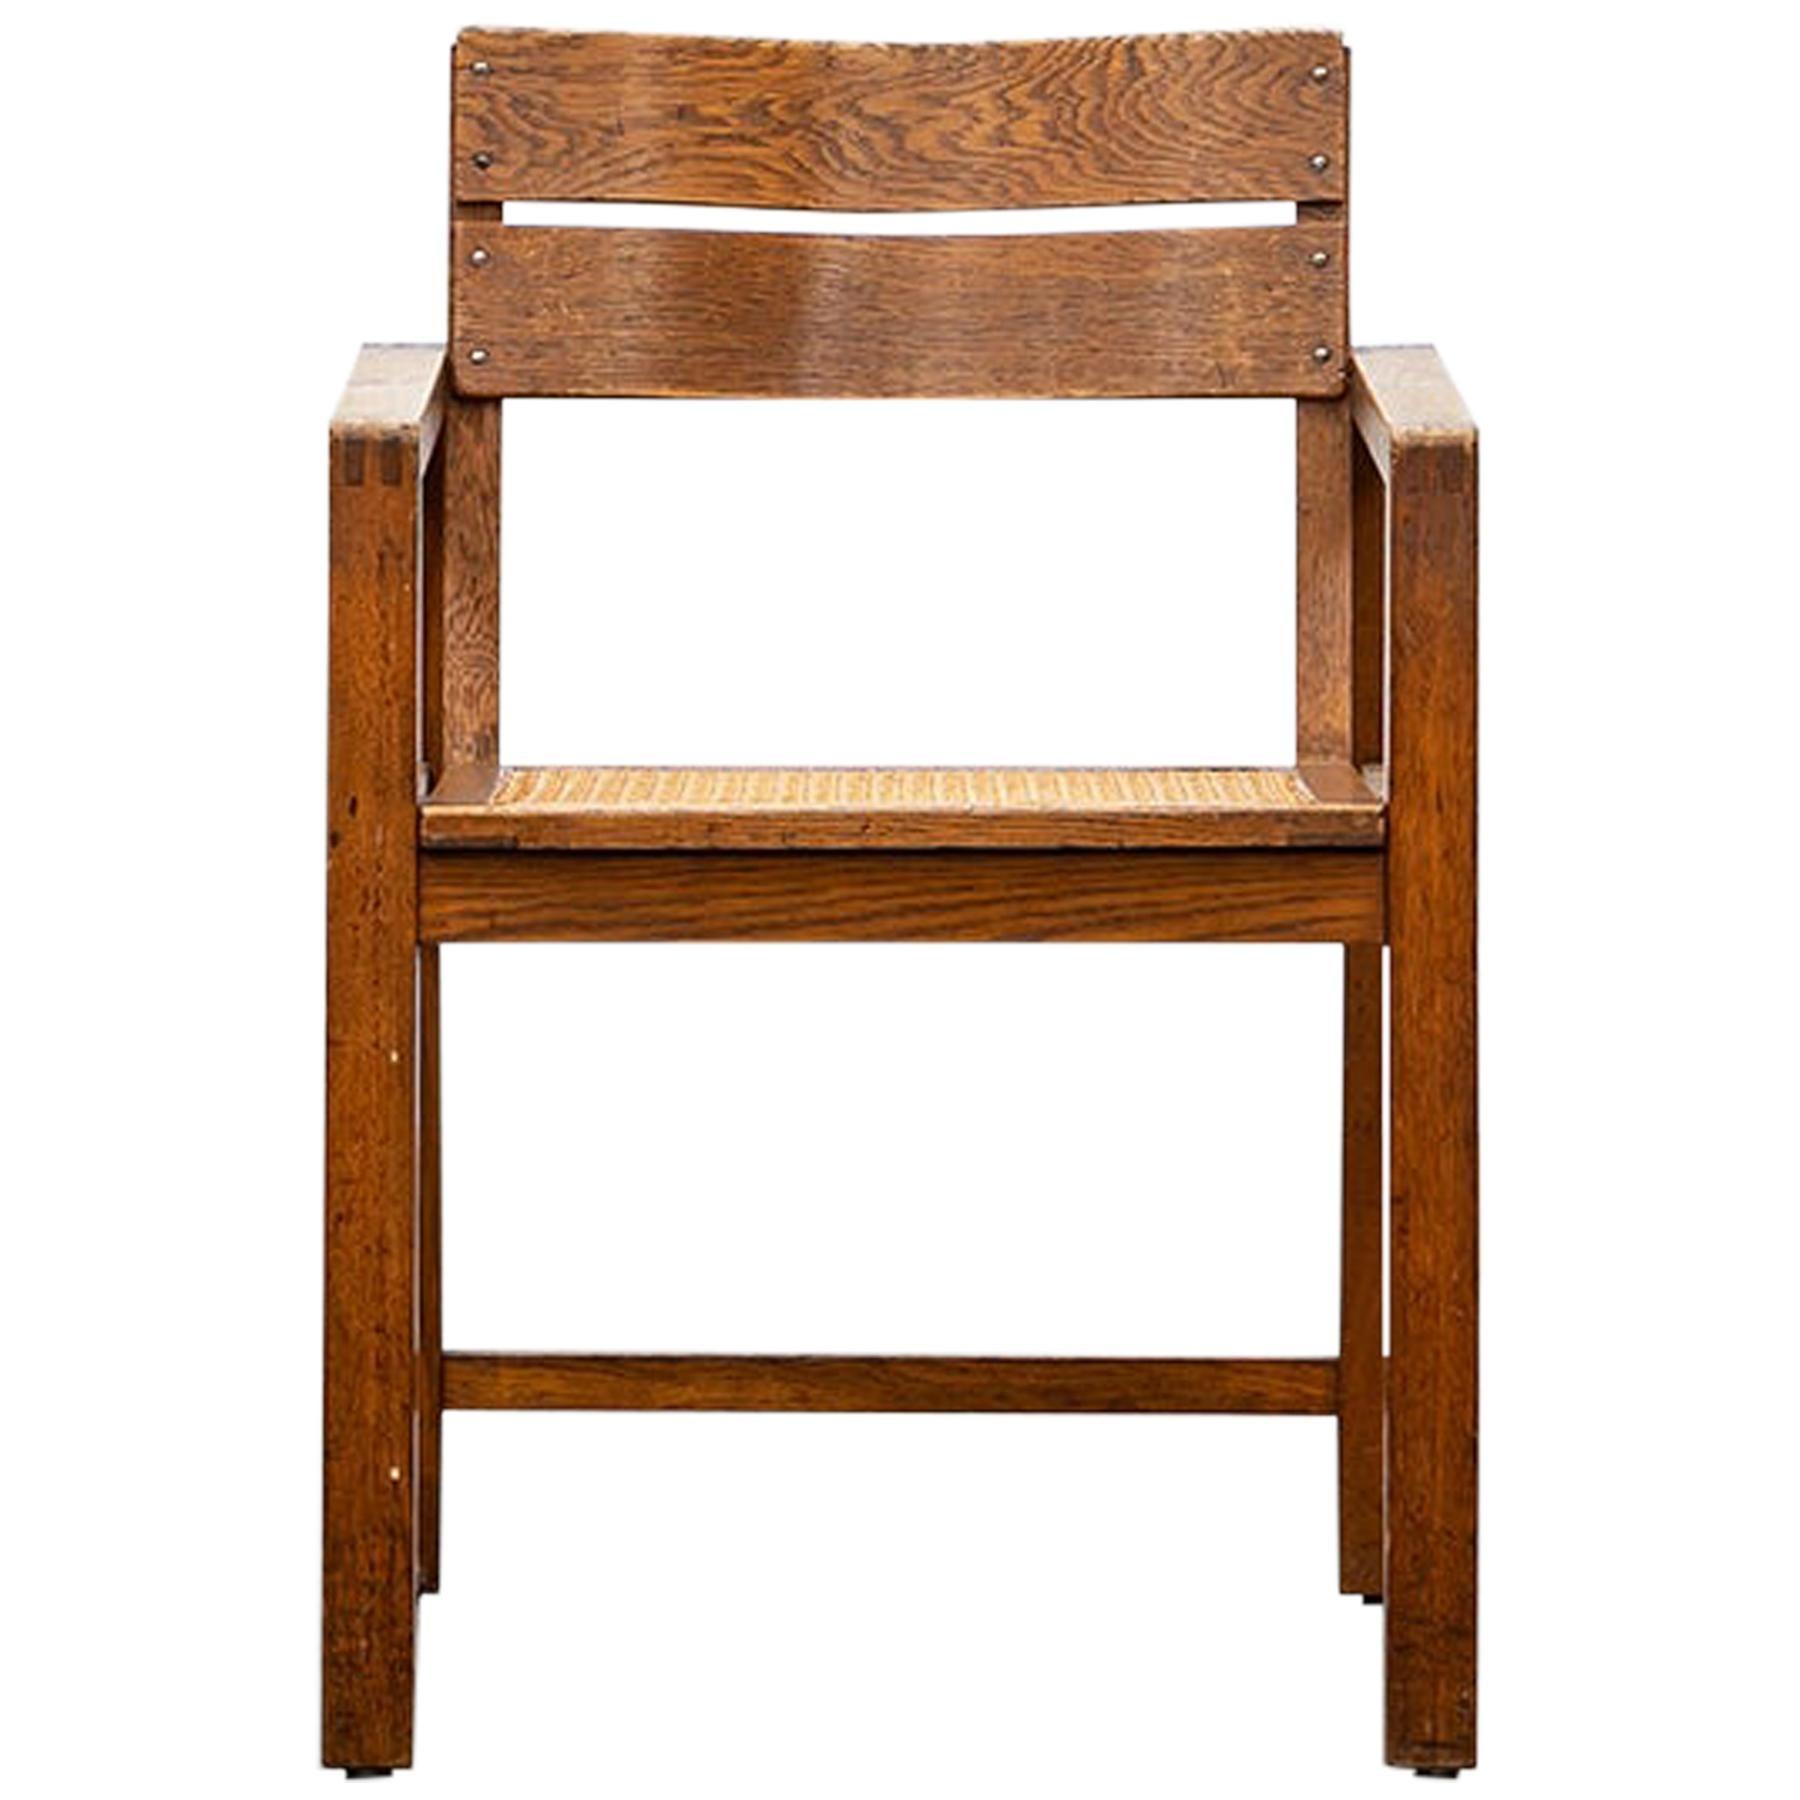 1920s Brown Beech Single Chair by Erich Dieckmann 'f'